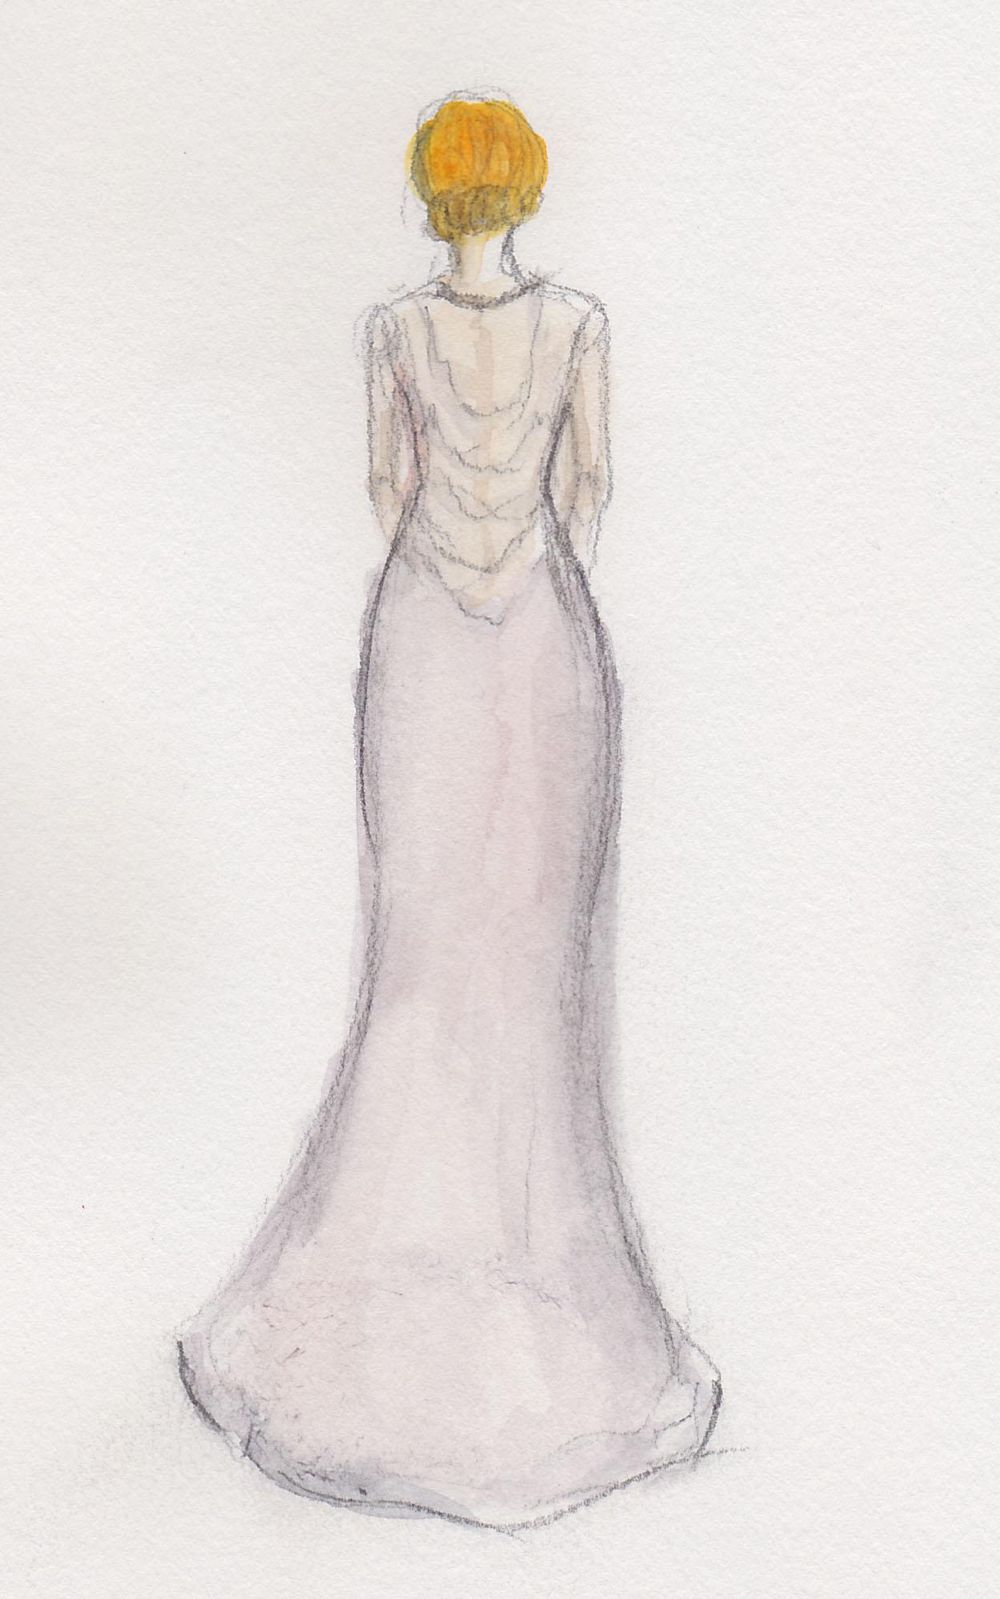 Final | Coral & Embellished - image 5 - student project